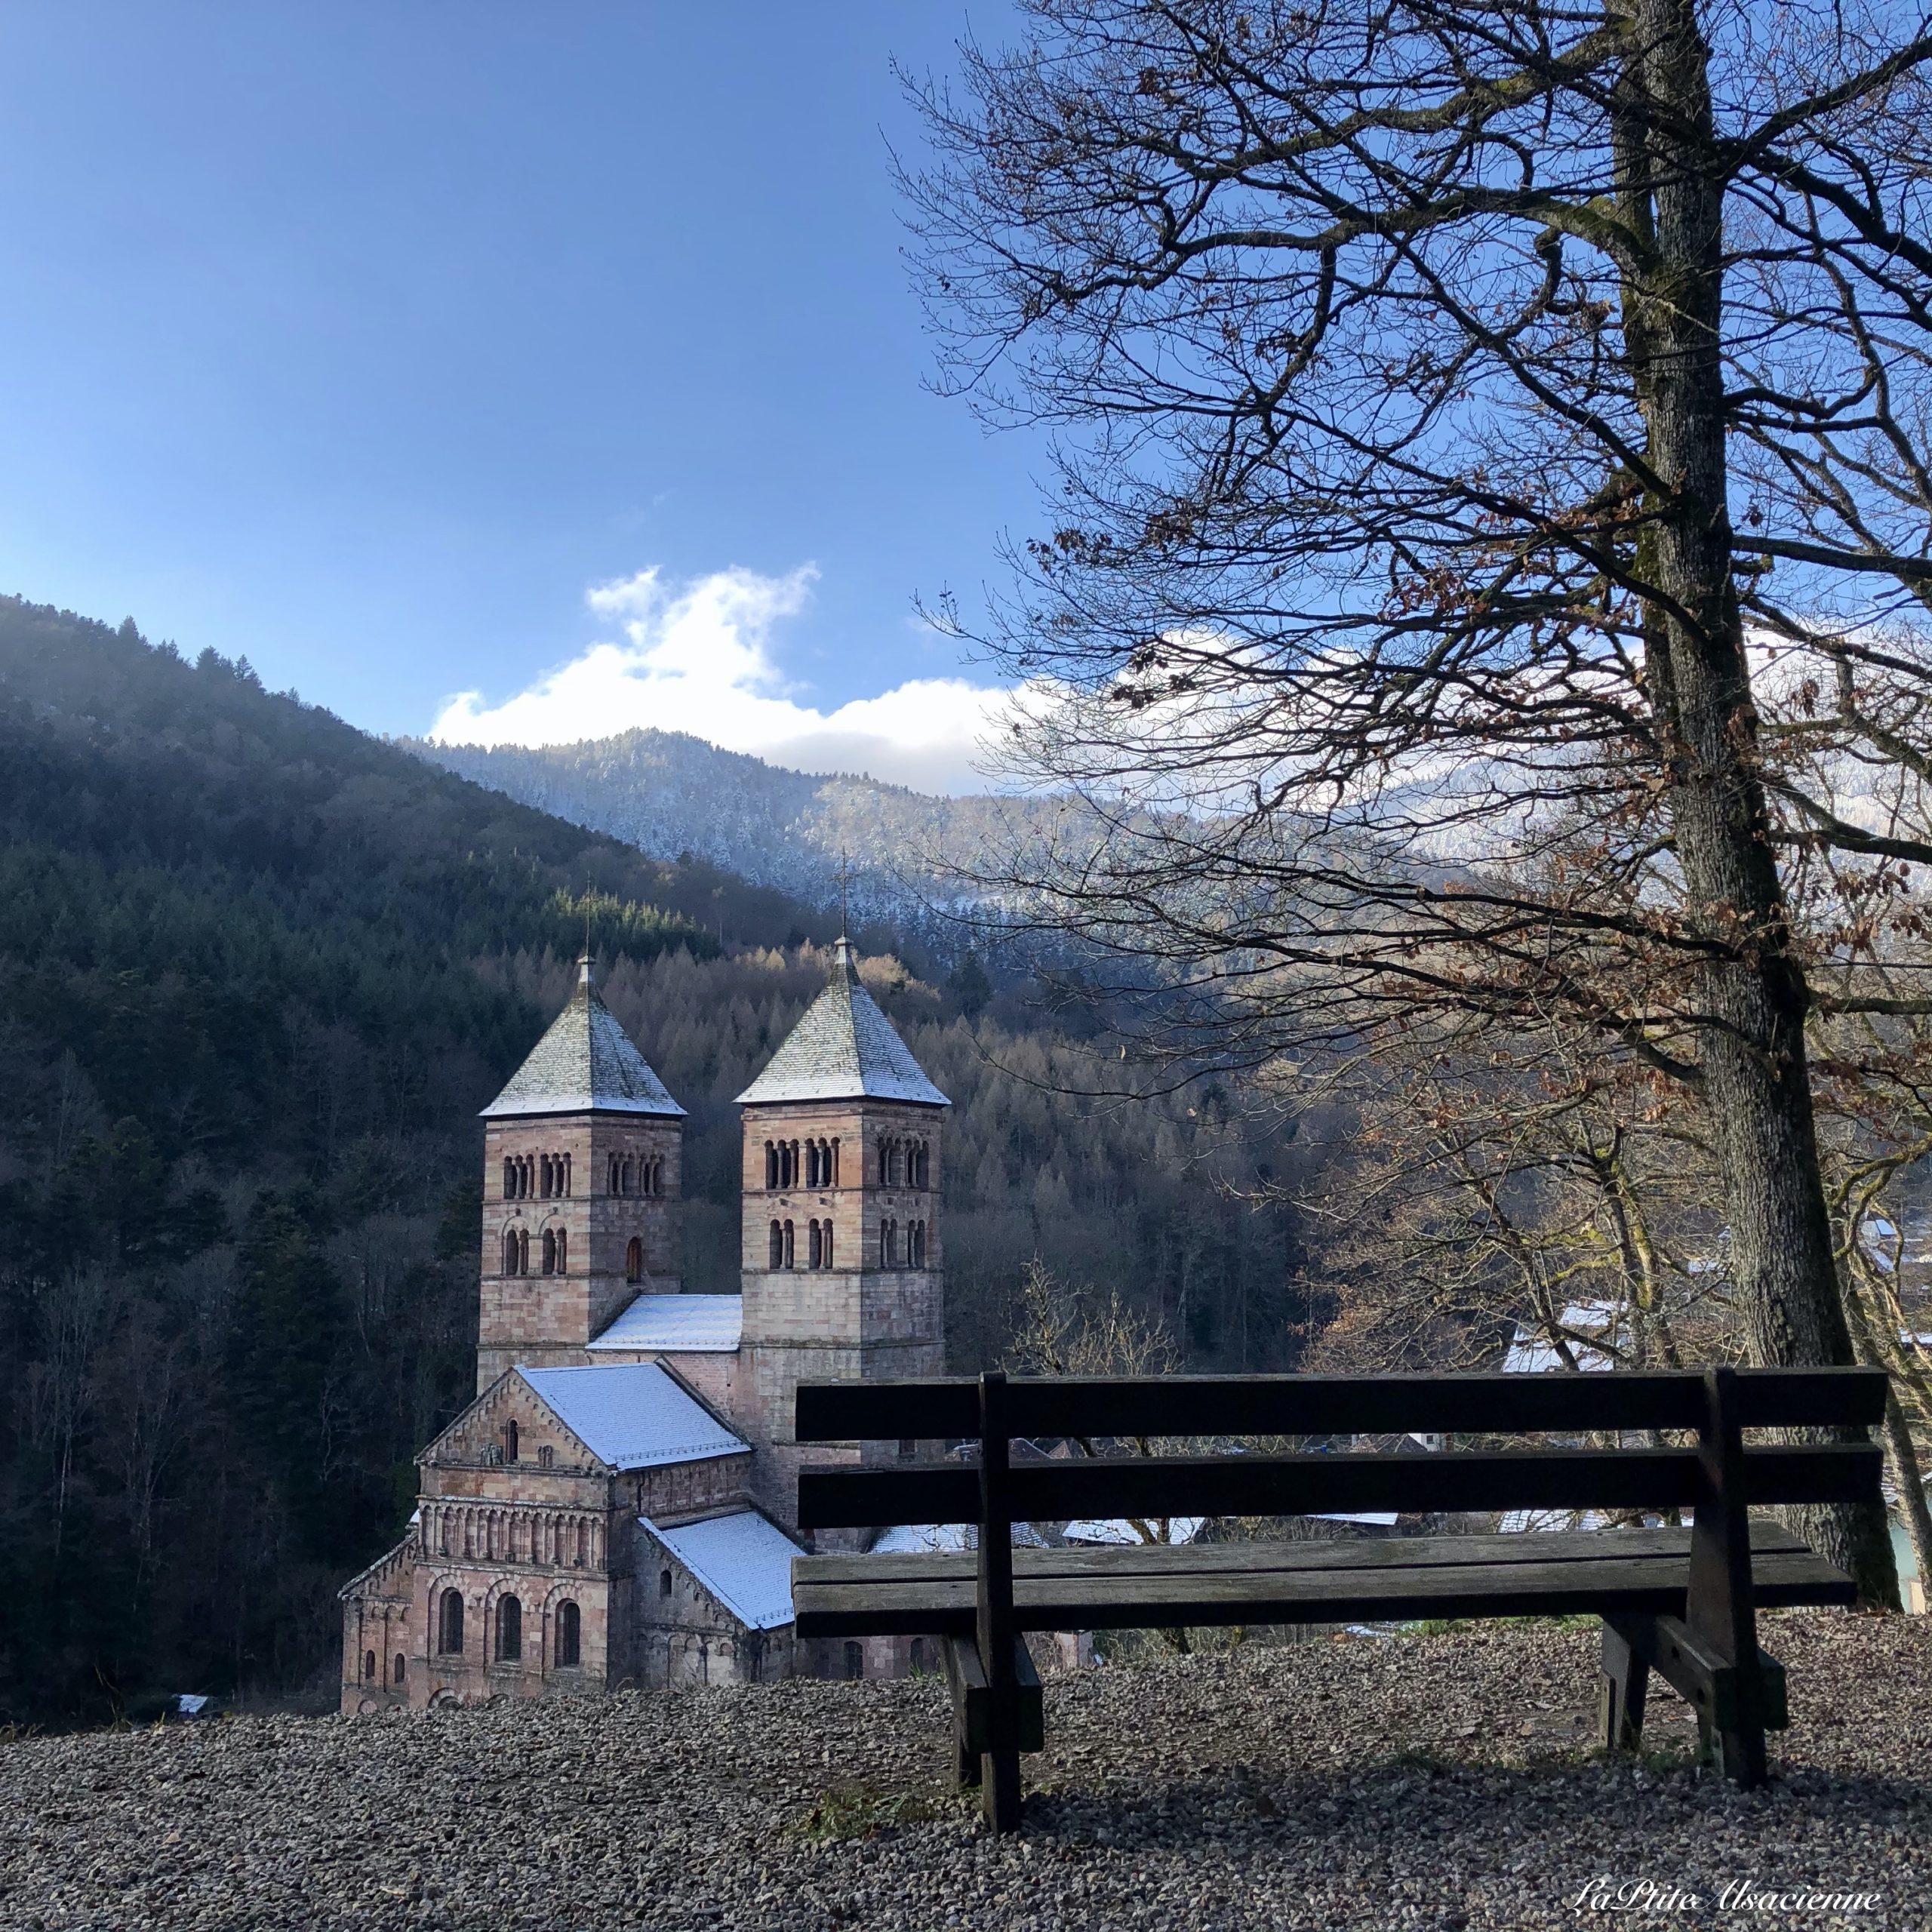 abbaye de murbach et banc ciel bleu